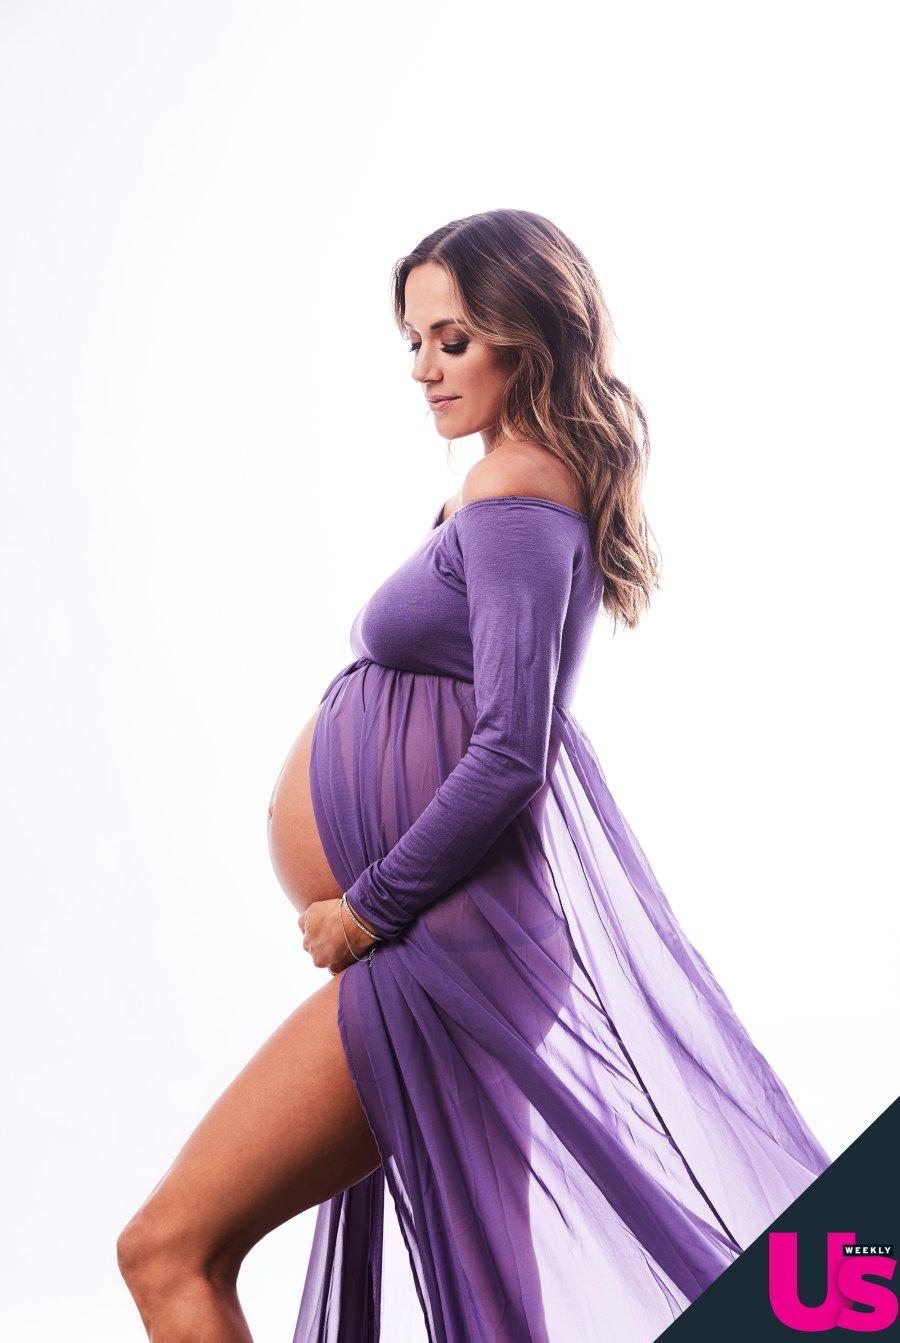 Jana Kramer pregnancy pics exclusive